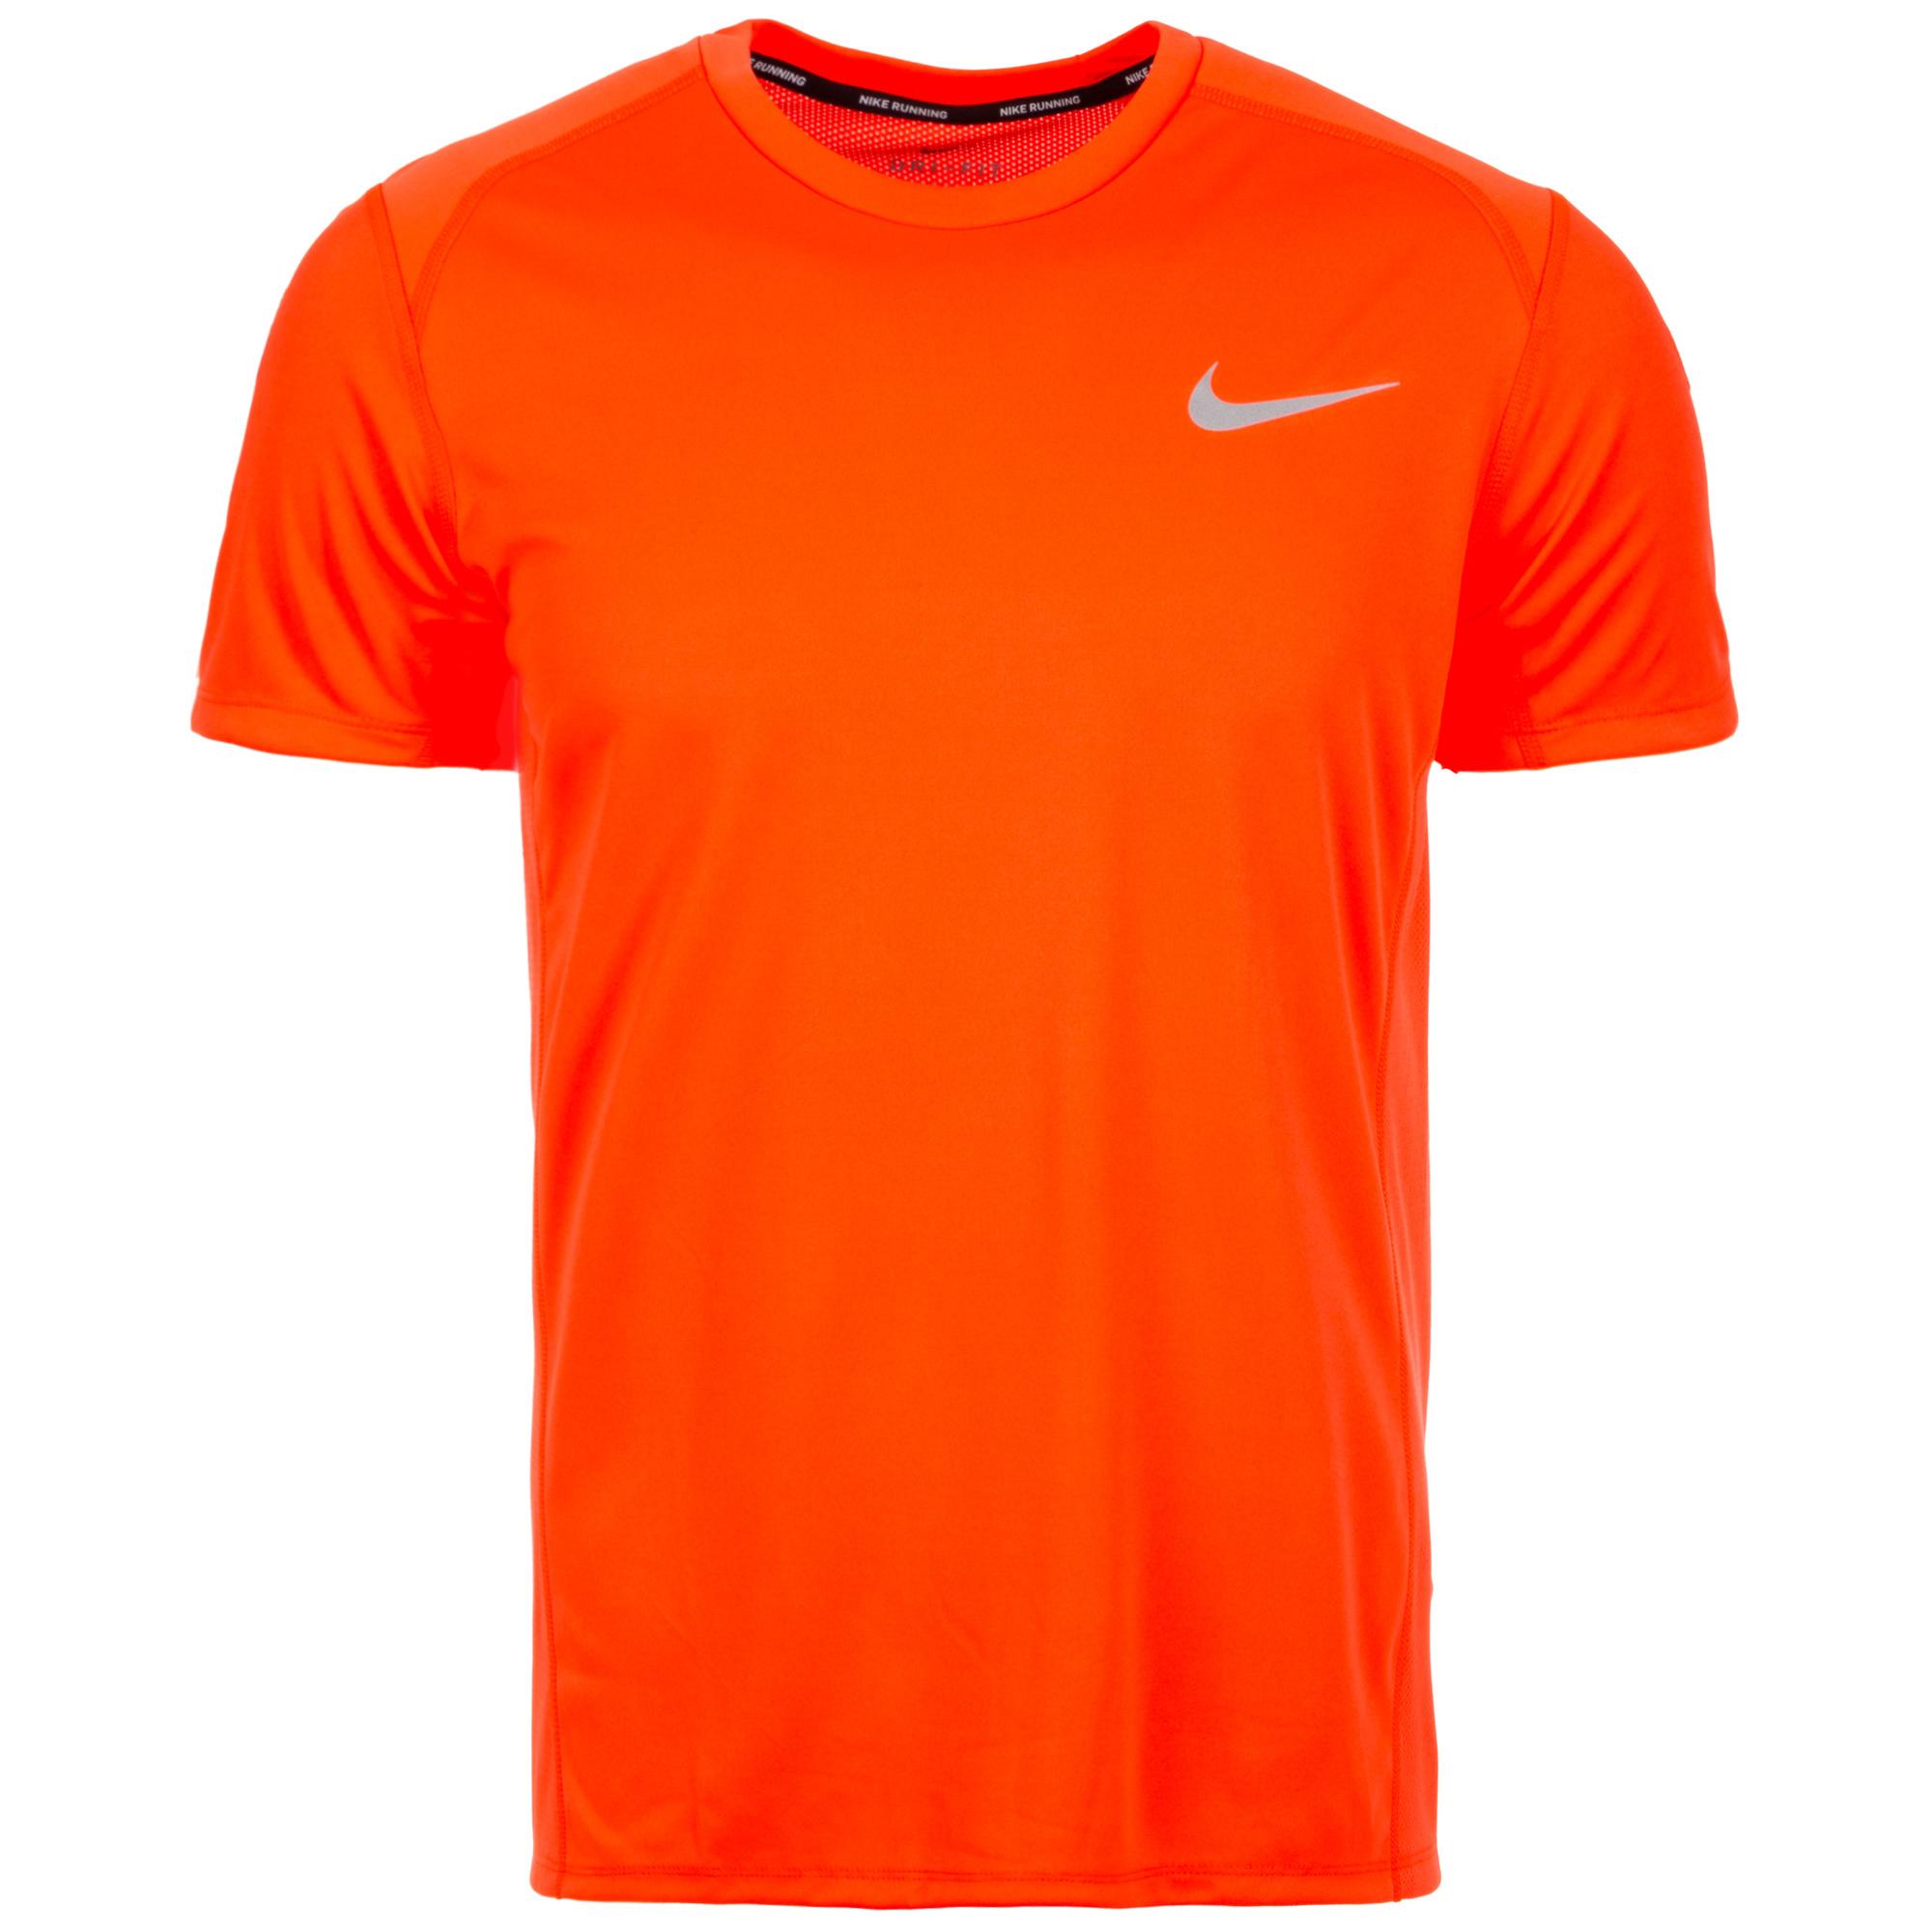 Nike Dry Miler Running T-Shirt Image